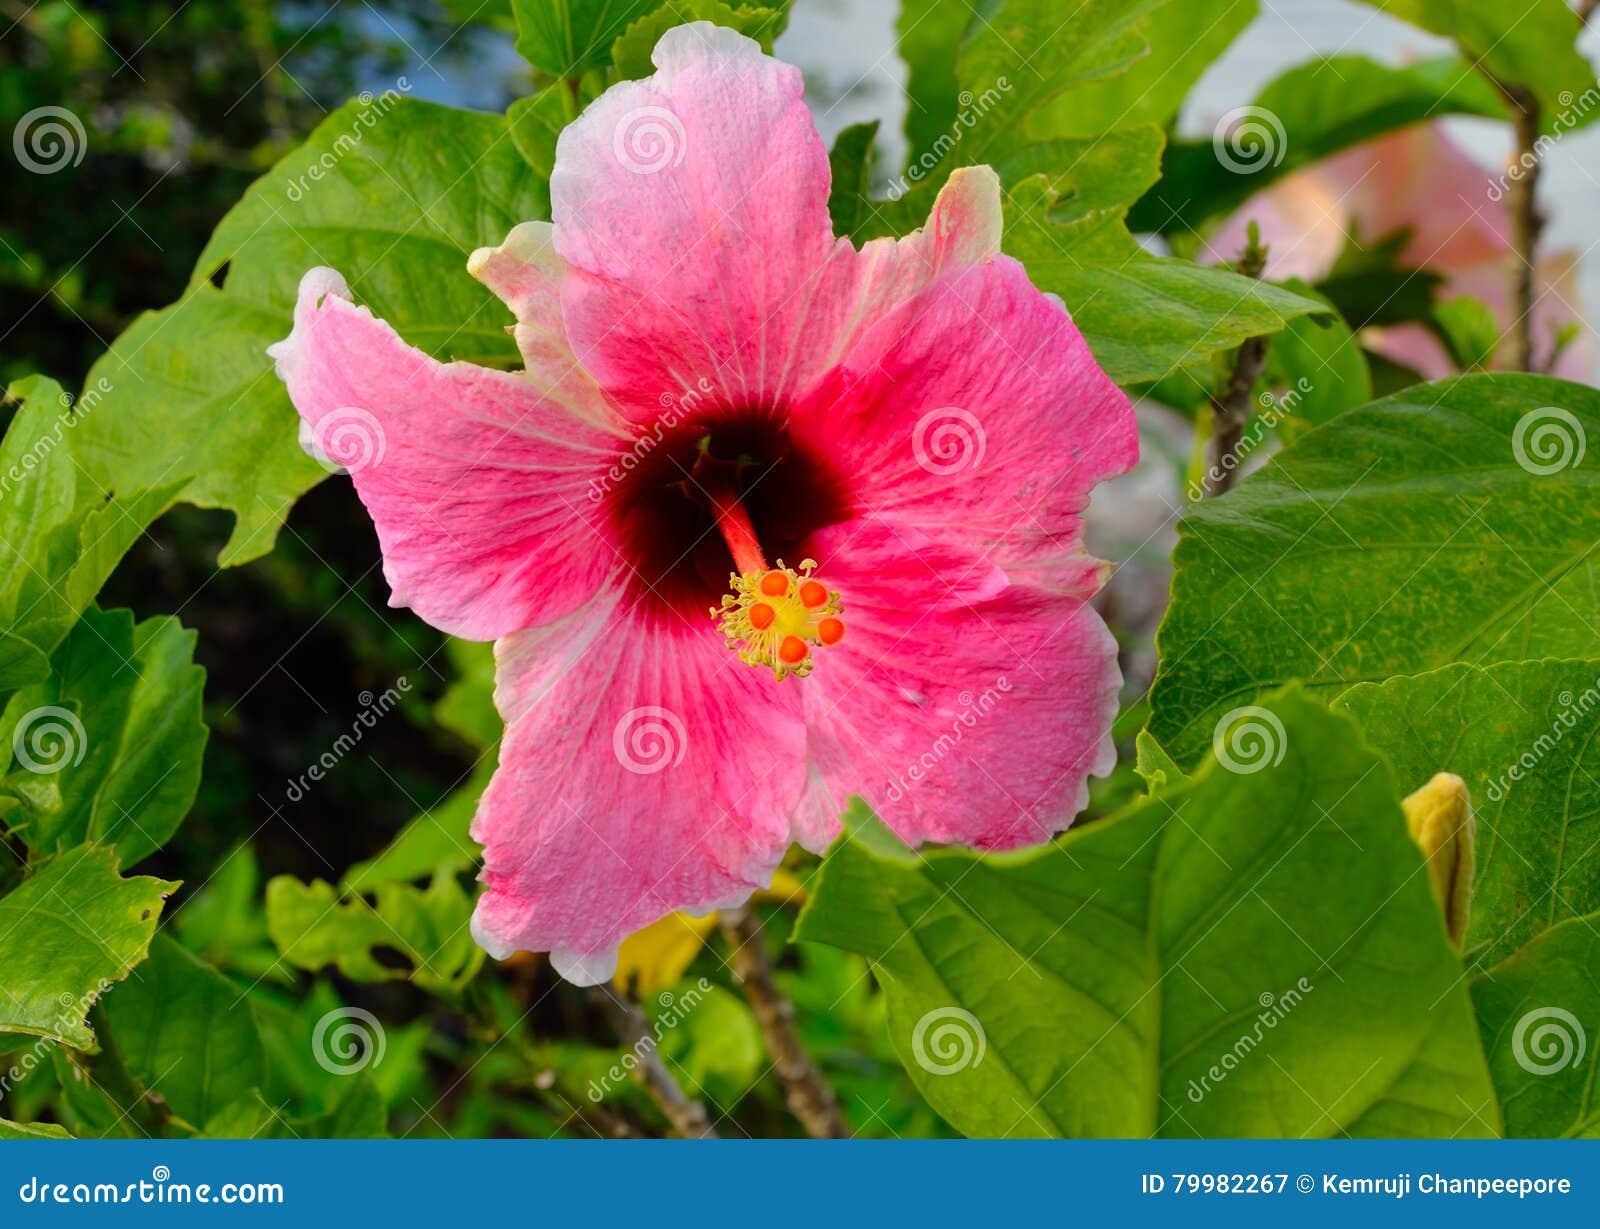 Pink chinese hibiscus flower stock image image of german royalty free stock photo izmirmasajfo